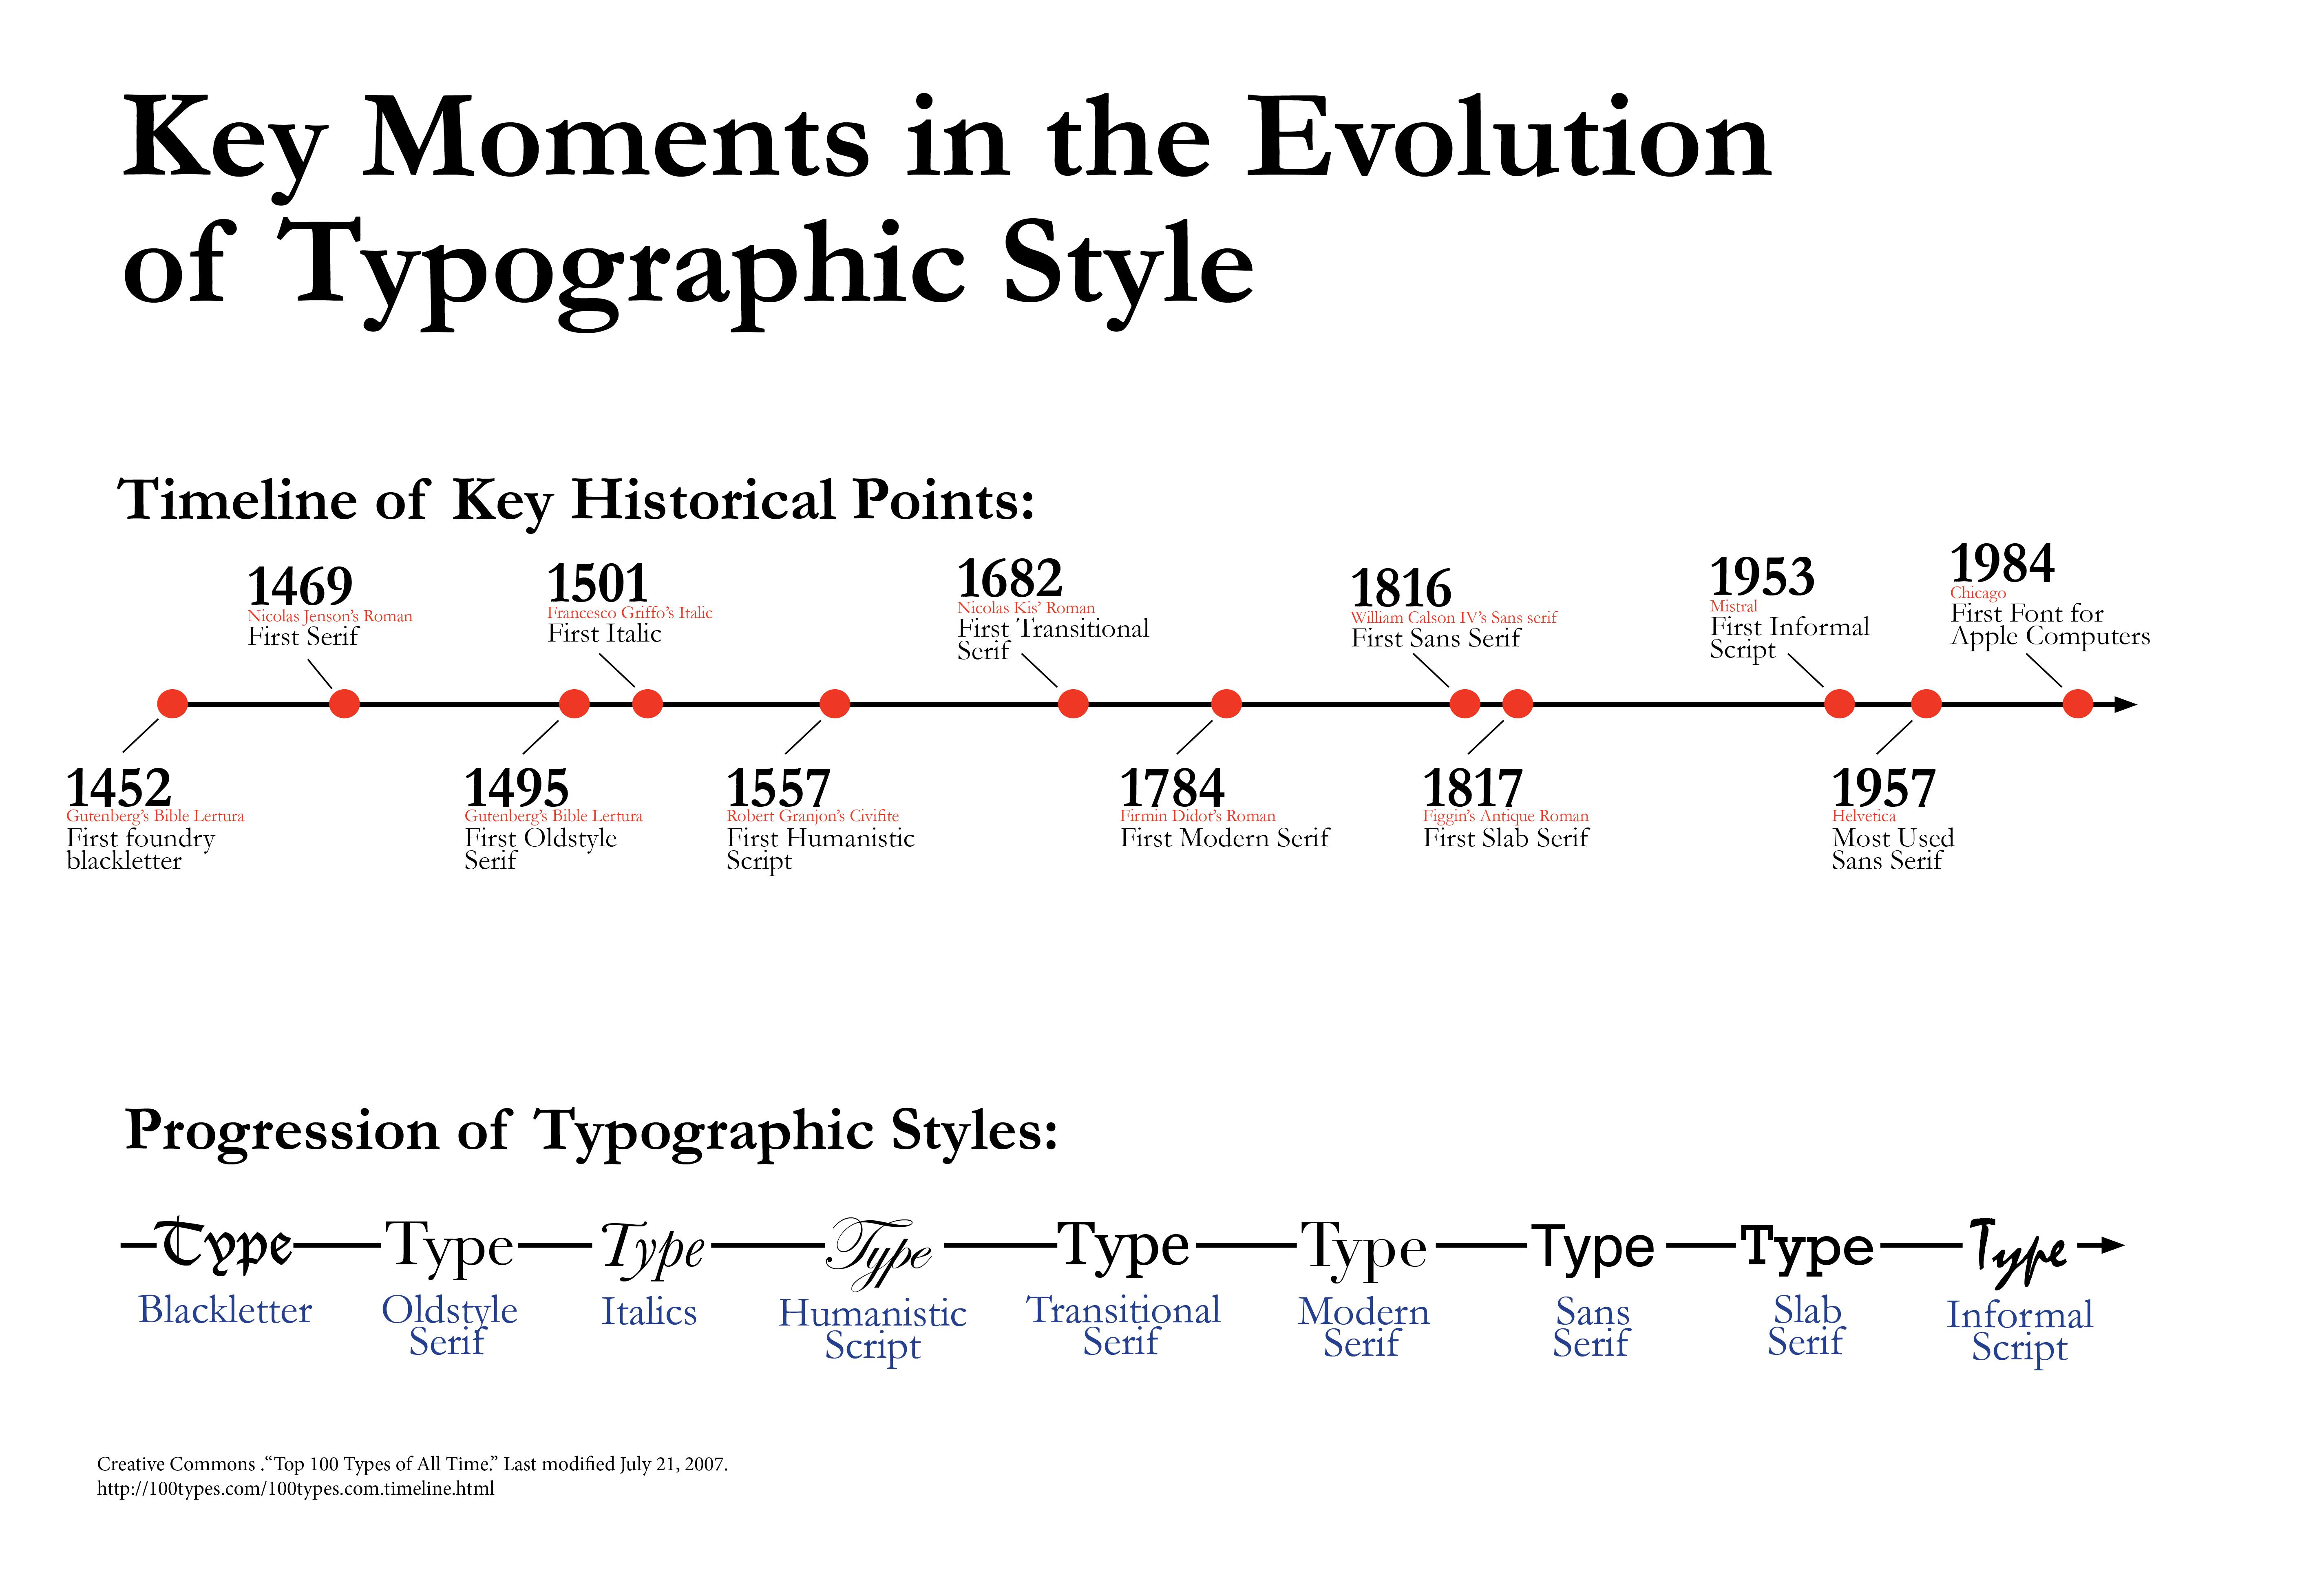 Momentos en la evolución tipográfica